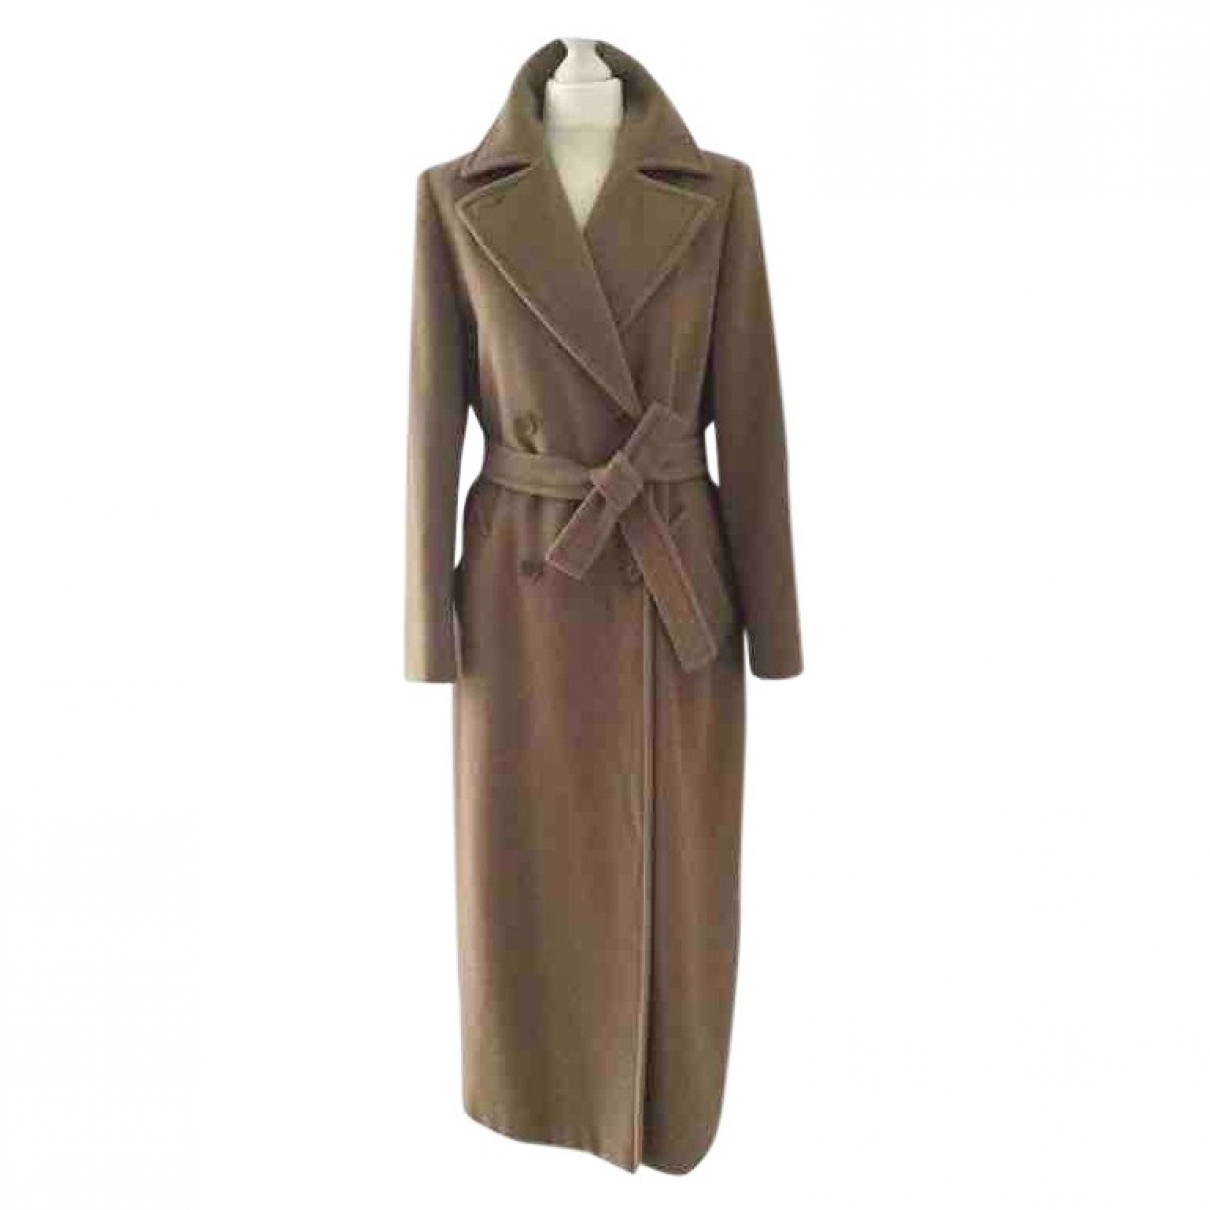 Max Mara \N Camel Wool coat for Women 42 IT